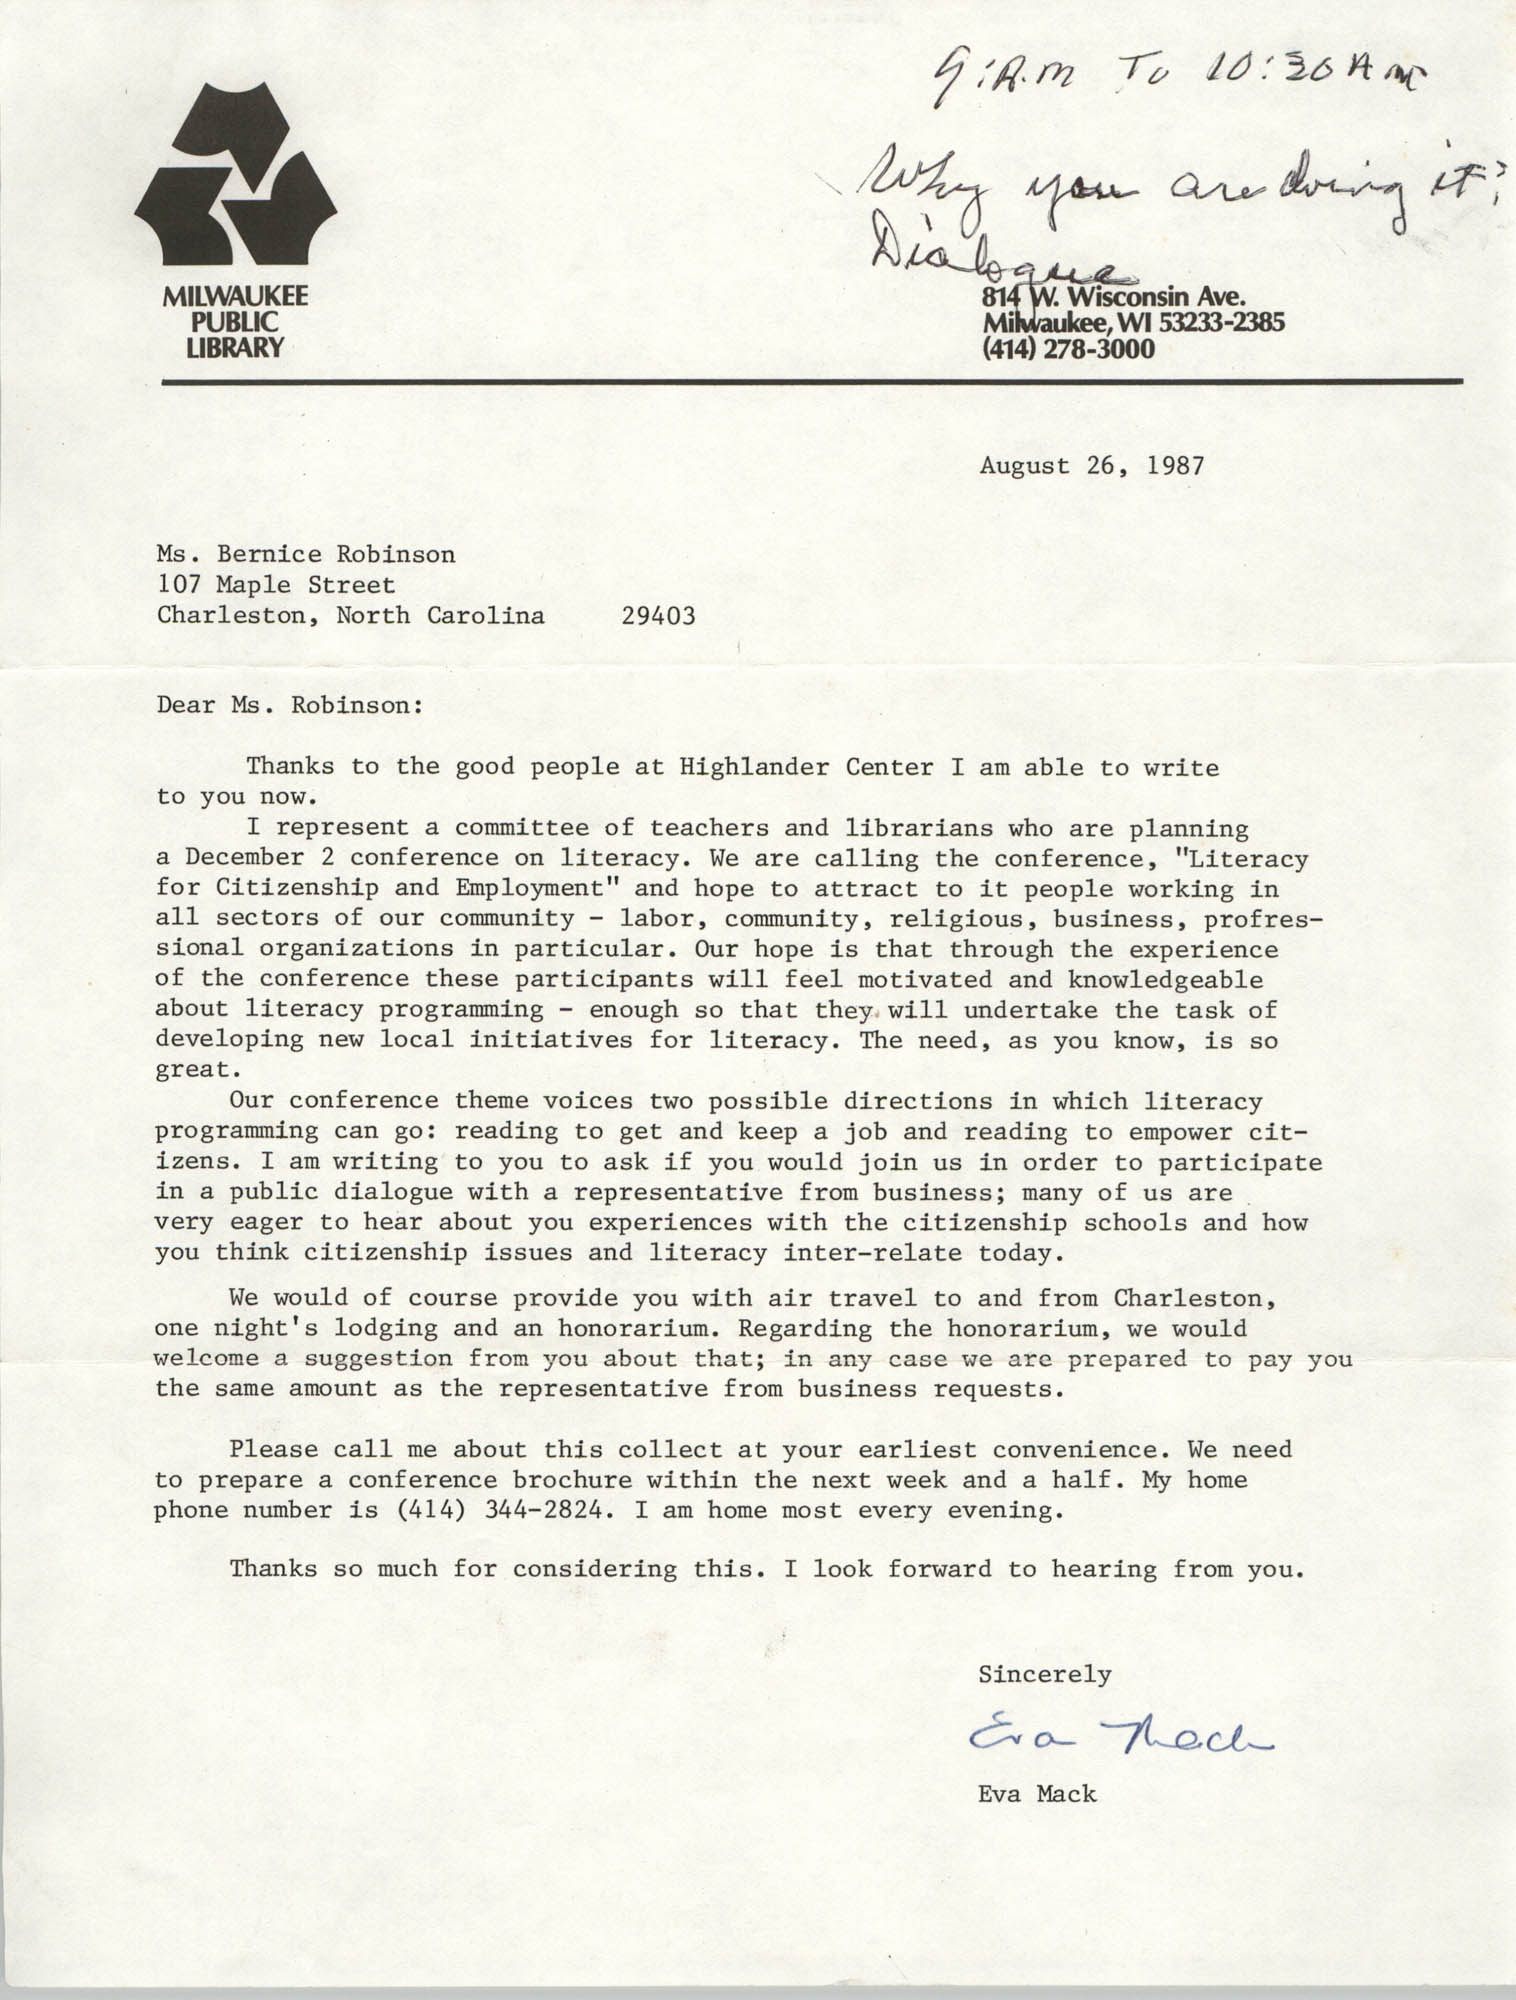 Letter from Eva Mack to Bernice Robinson, August 26, 1987